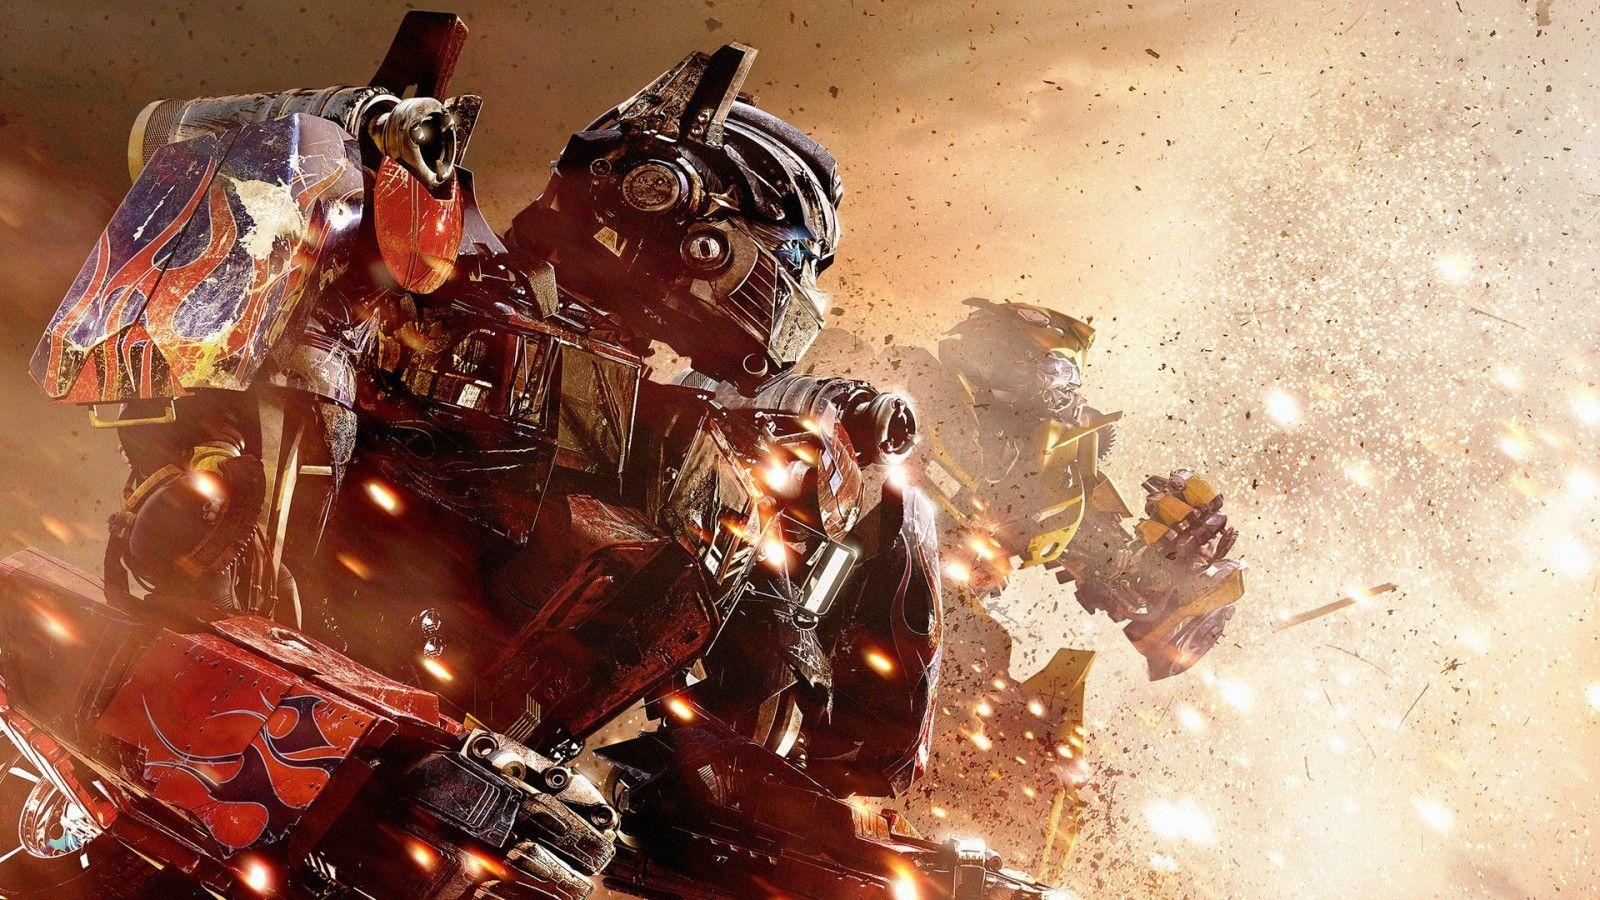 Optimus Prime Transformers HD Background Wallpaper